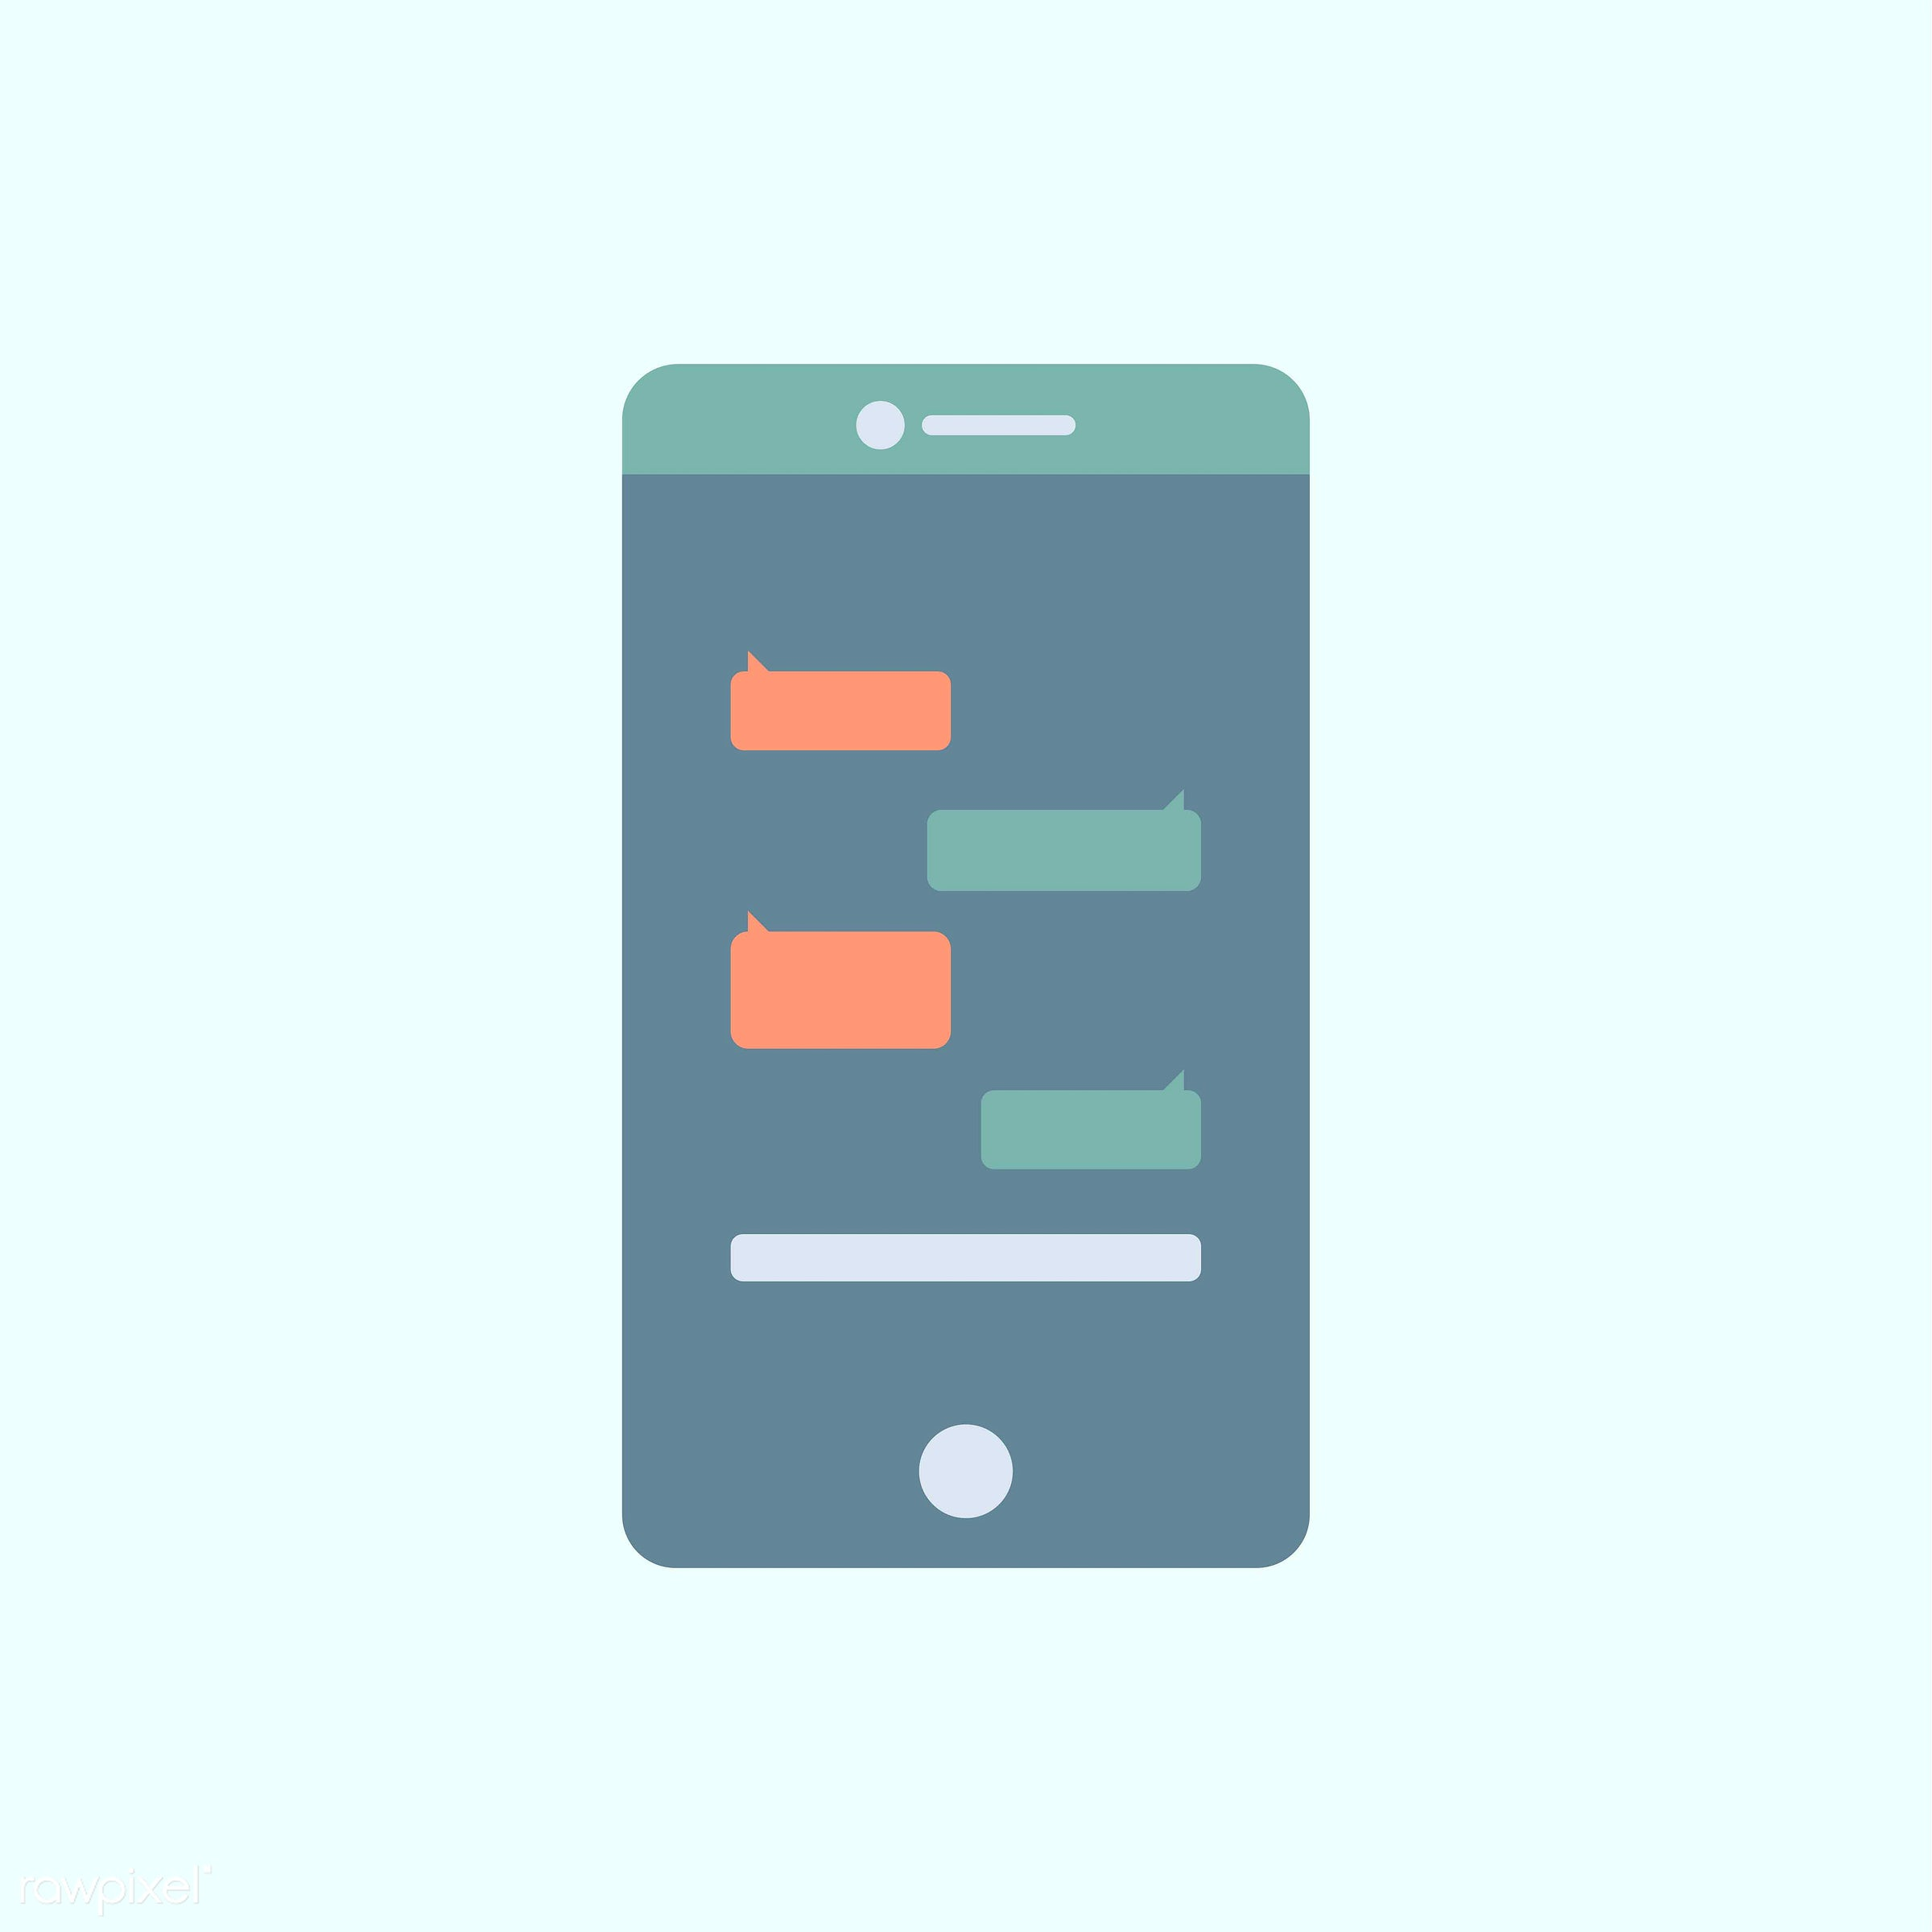 vector, illustration, graphic, blue, tech, technology, digital, device, internet, phone, wireless